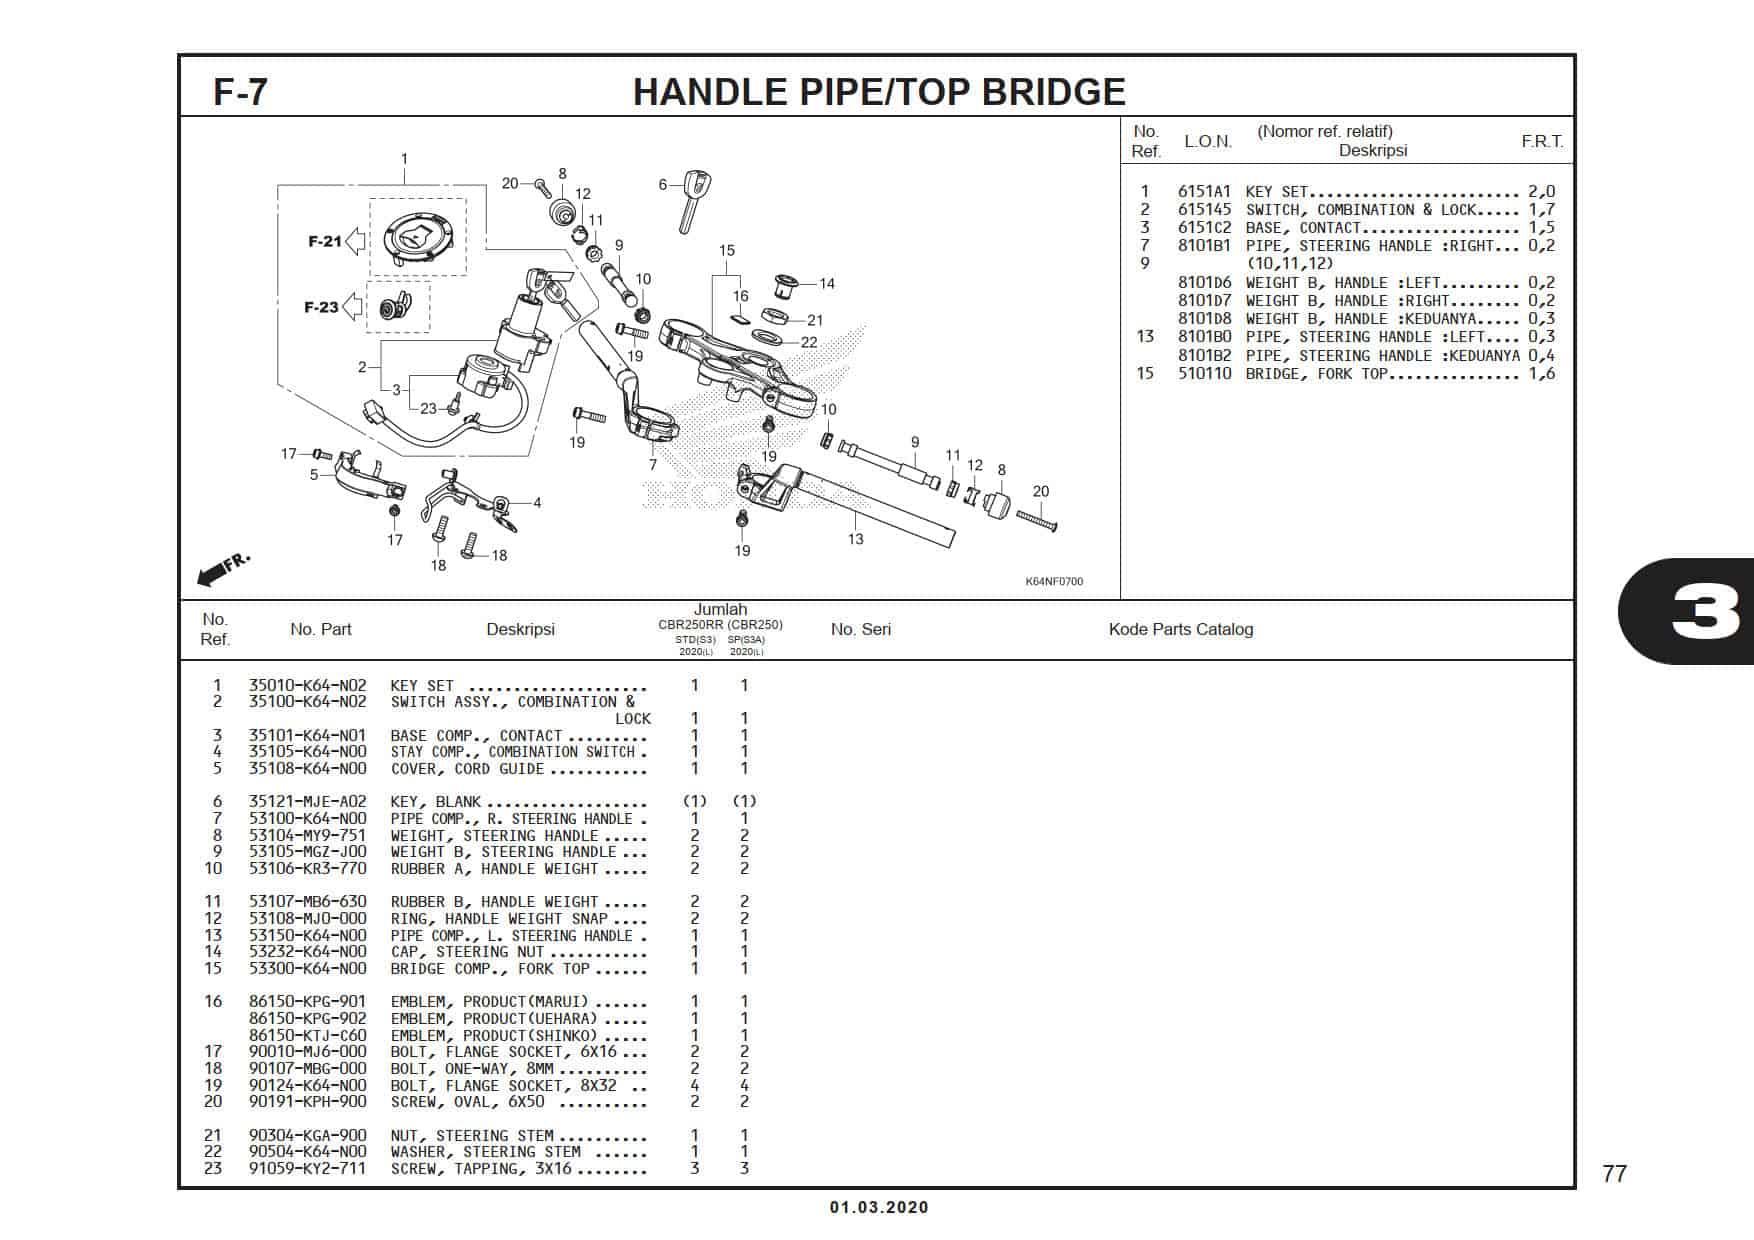 F-7 Handle Pipe/Top Bridge